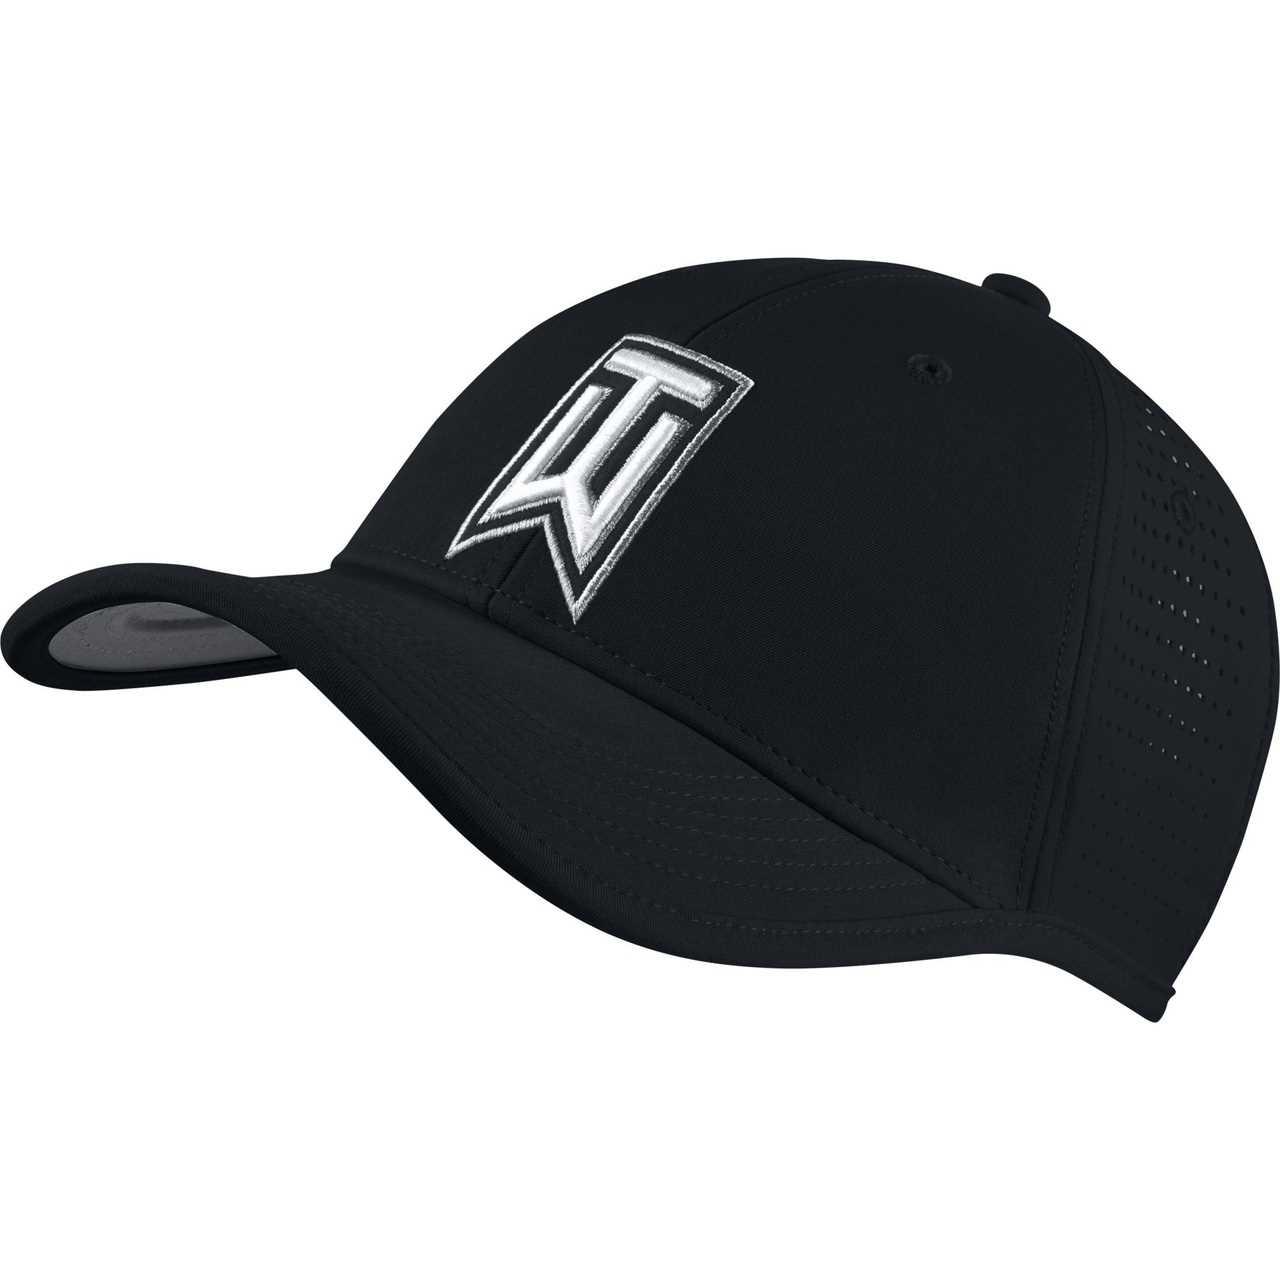 2883172e00599 Nike Golf TW Ultralight Tour Adjustable Hat - Black White